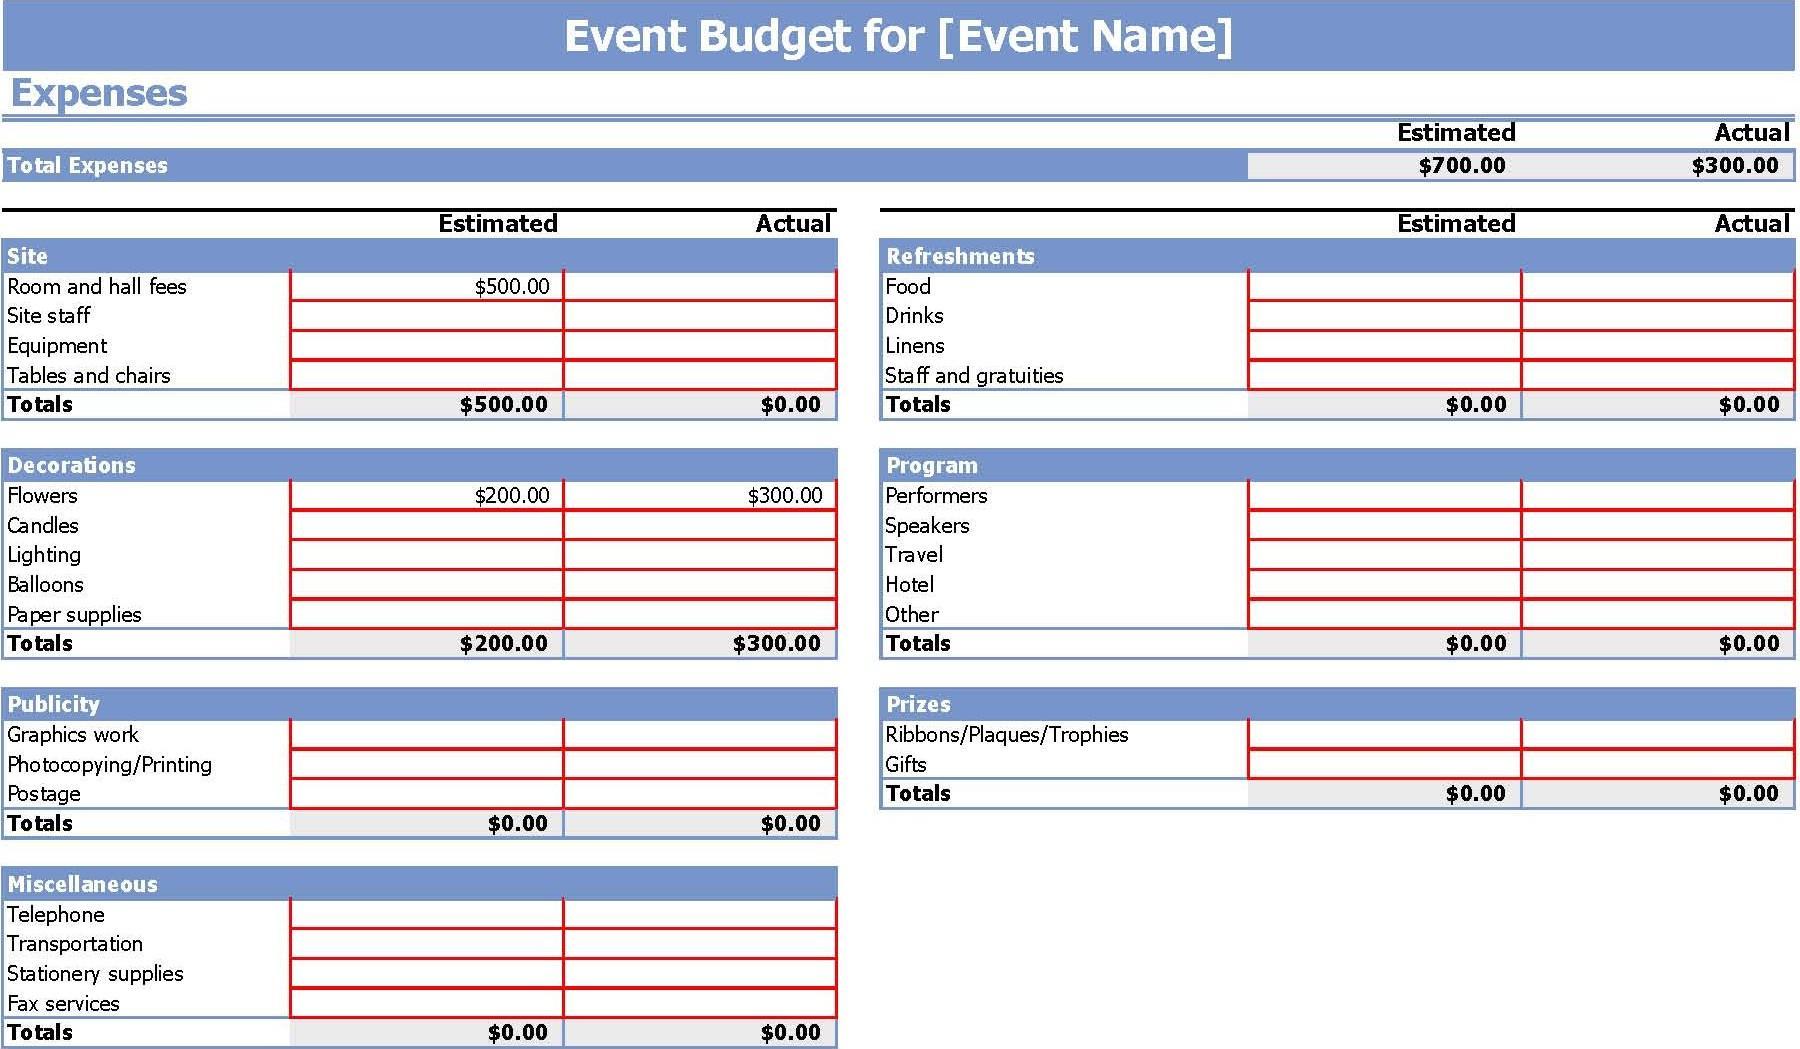 Event Budget Spreadsheet Template